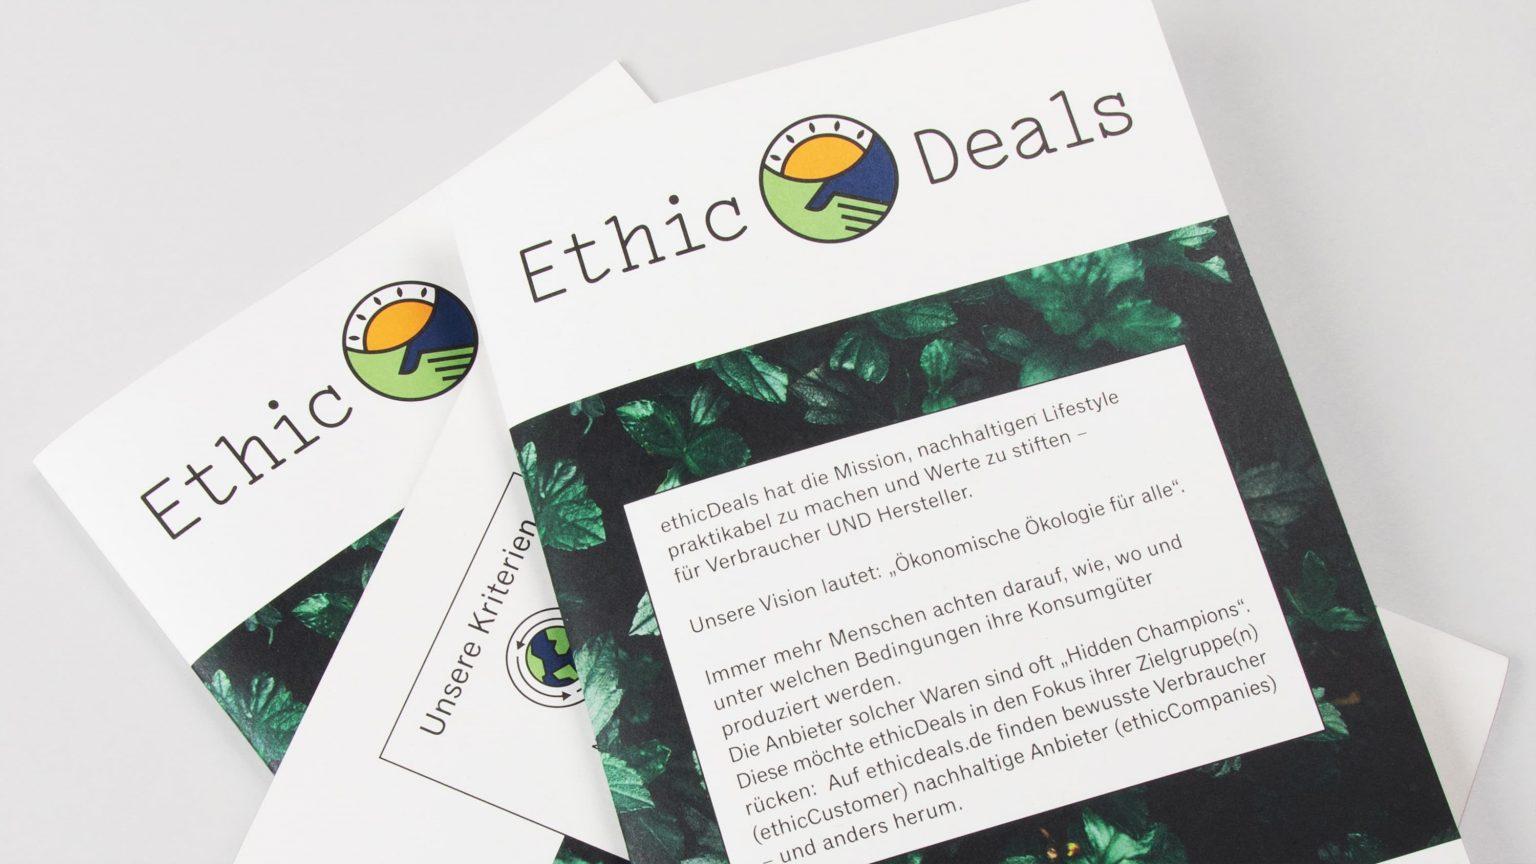 Ta-Trung Ethic Deals 00